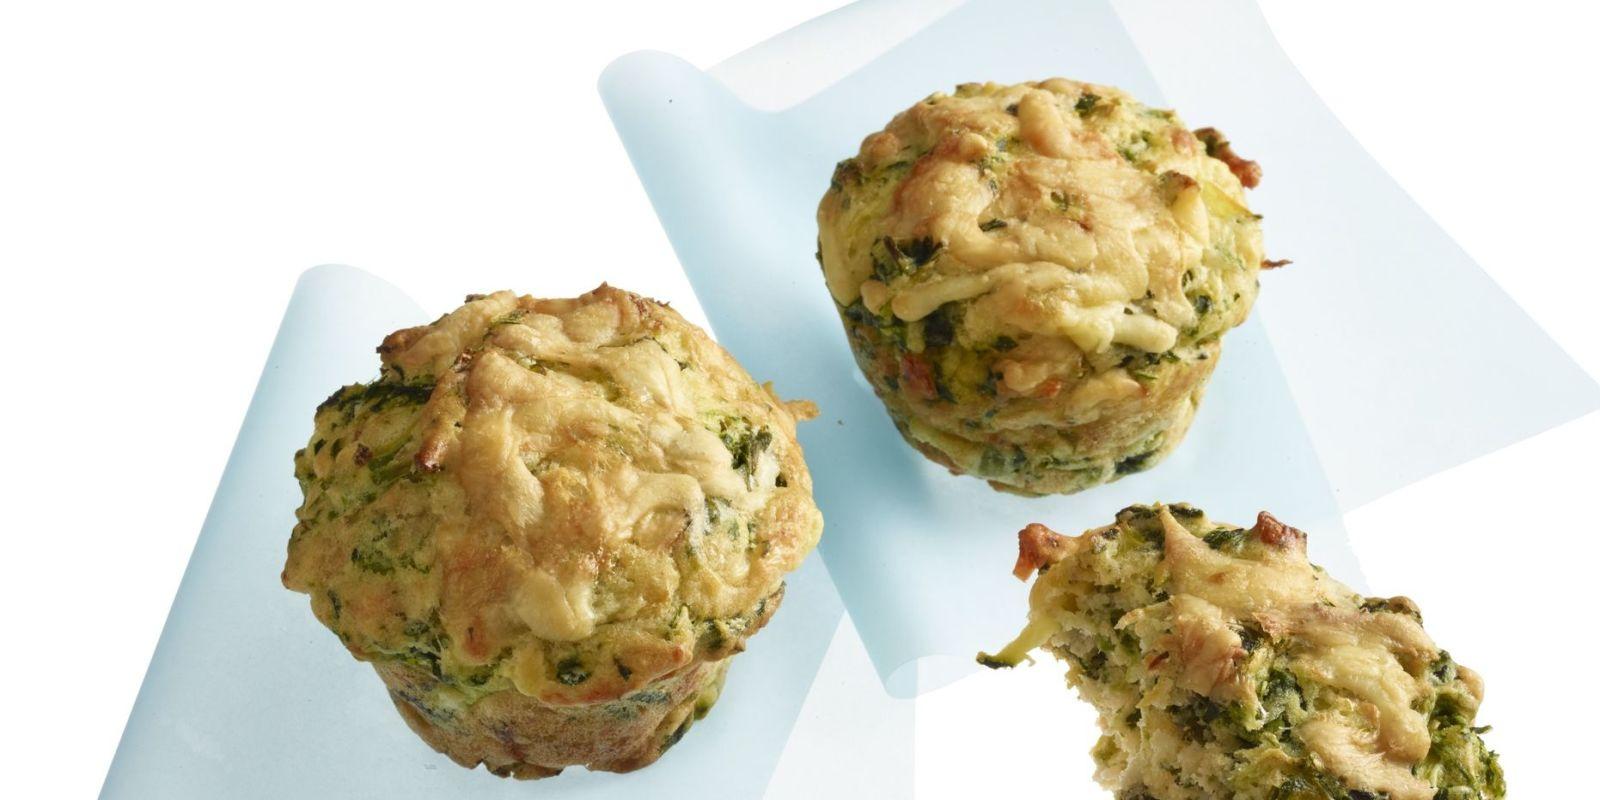 Cheddar, Zucchini Scallion Muffins